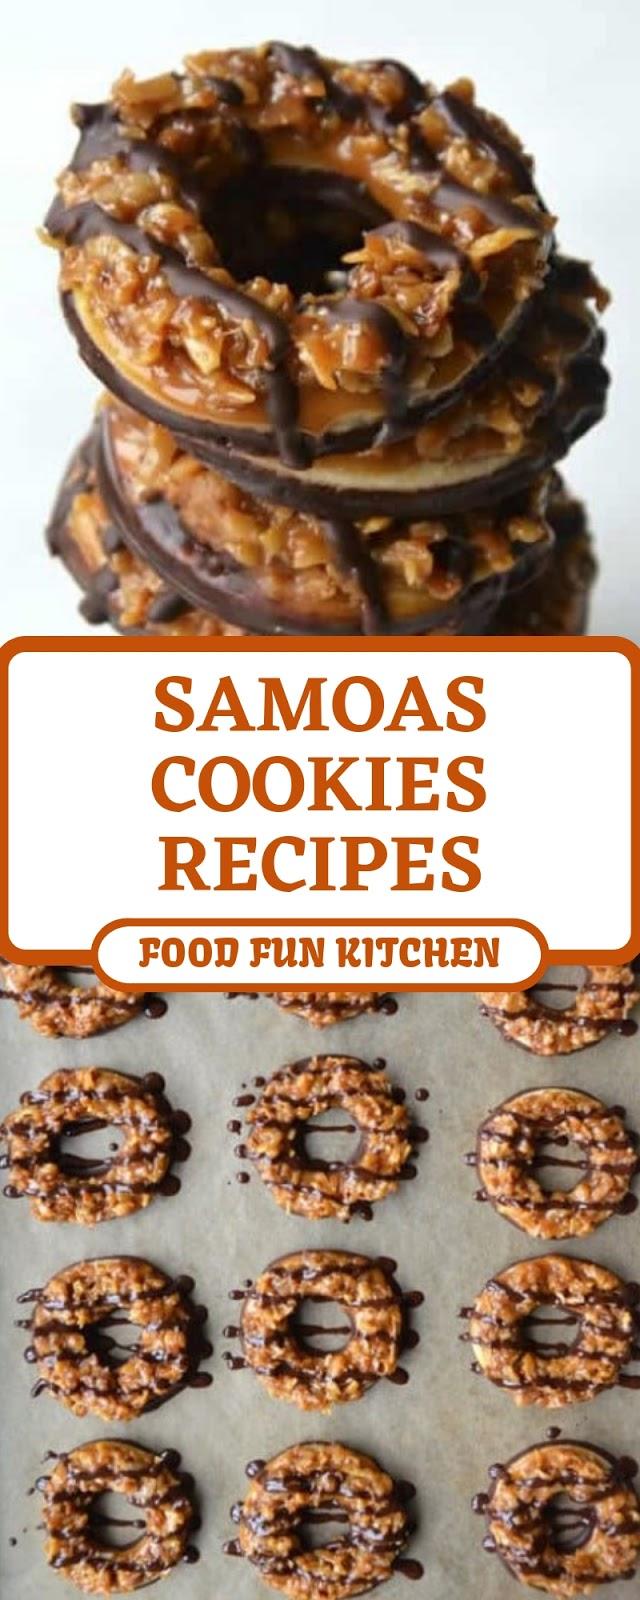 SAMOAS COOKIES RECIPES